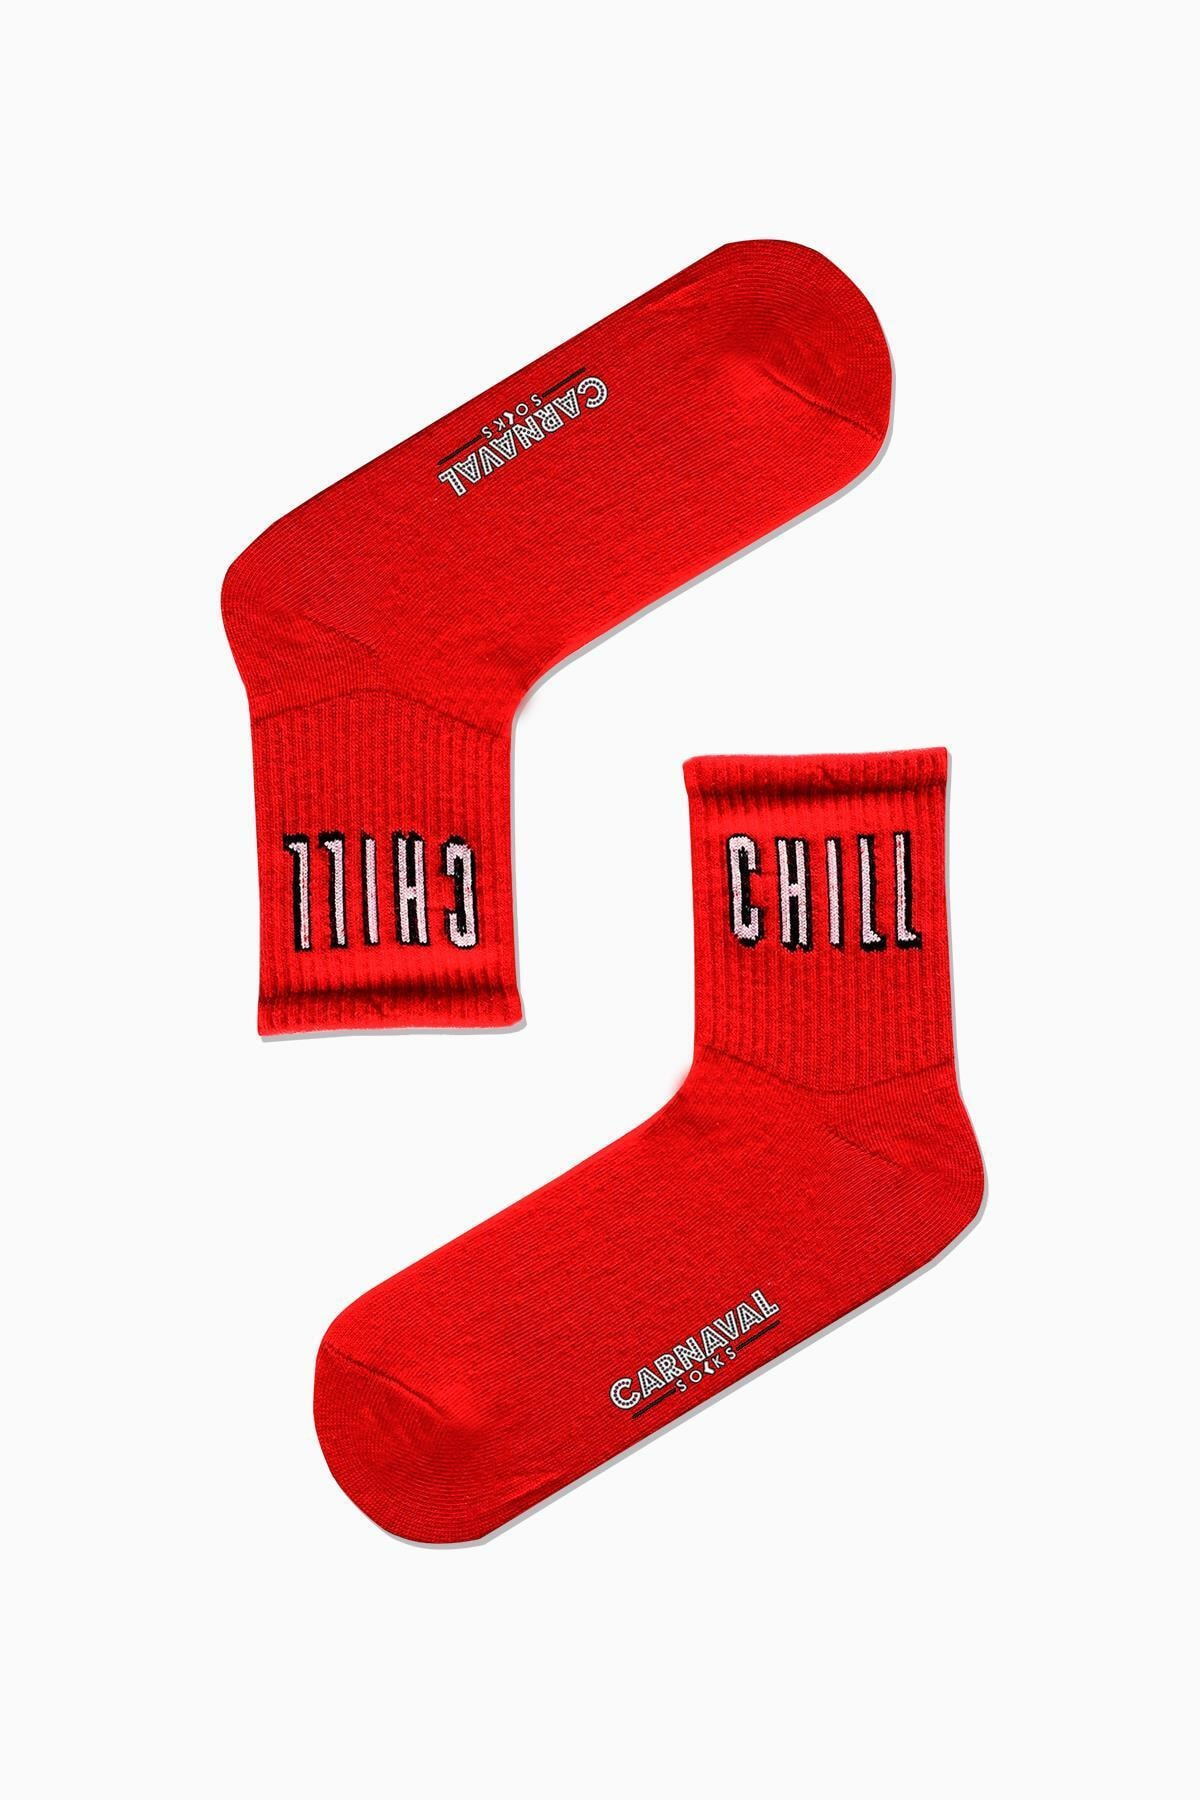 CARNAVAL SOCKS 7'li Nyc Yazılı Desenli Renkli Spor Çorap Set 2